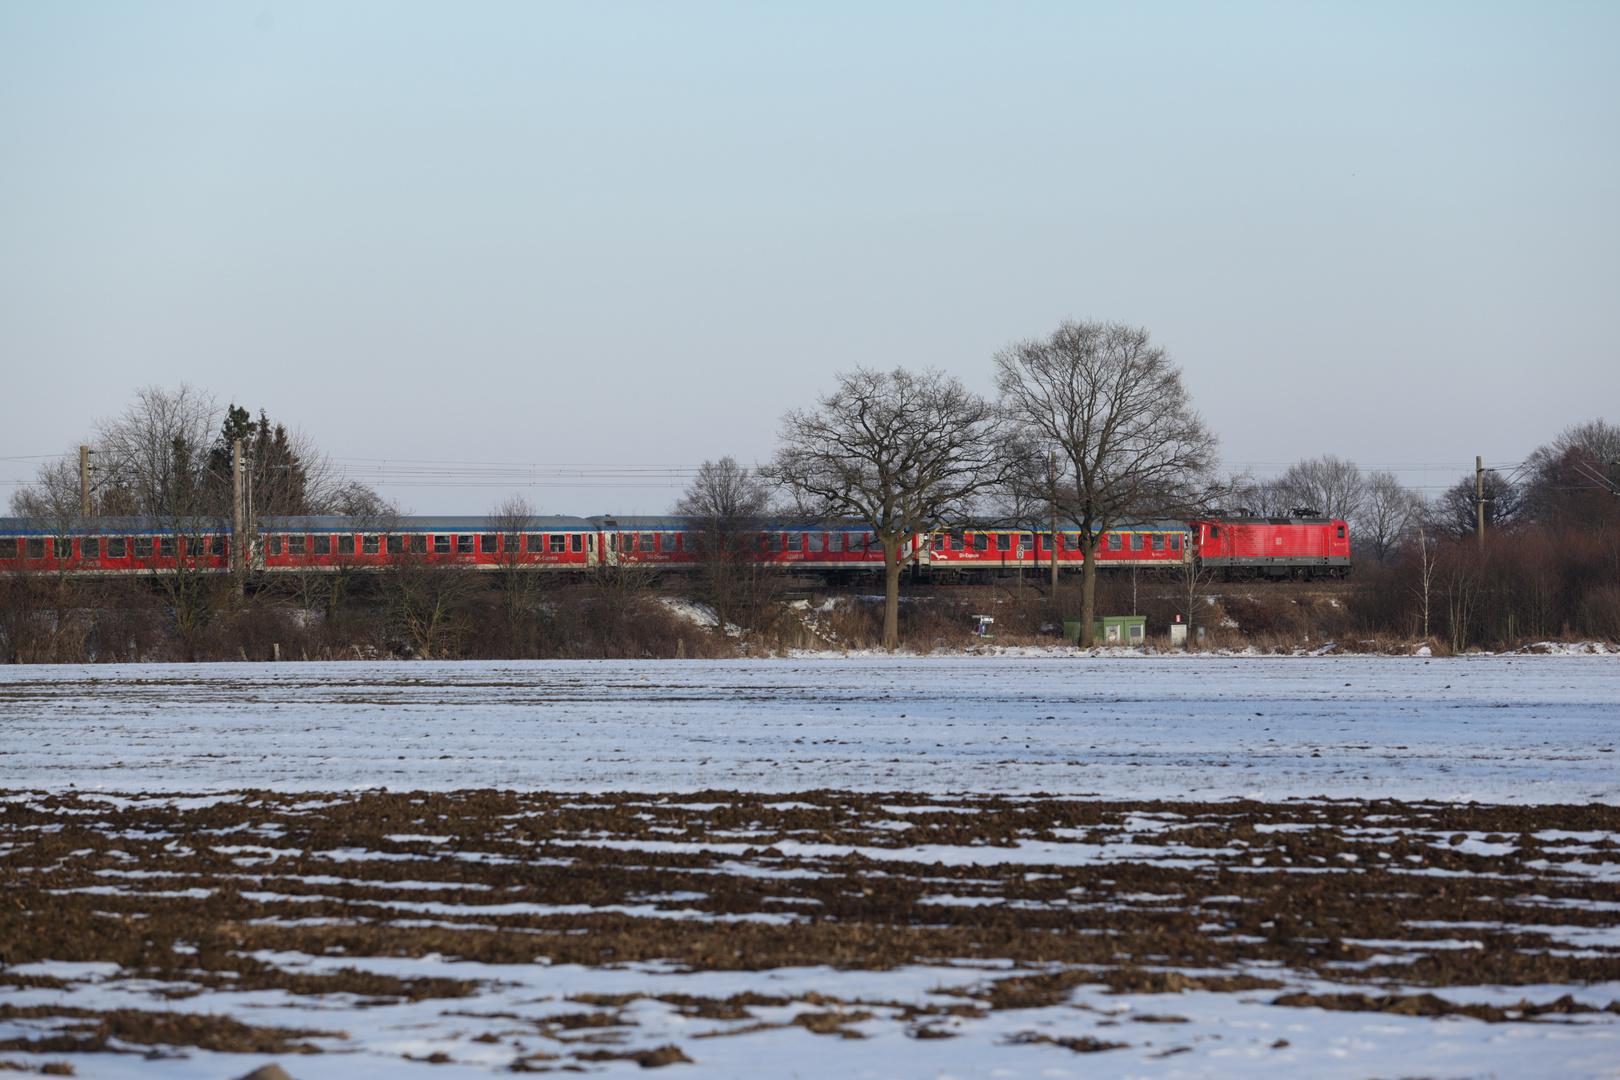 Regionalexpress Flensburg-Hamburg bei Krogaspe